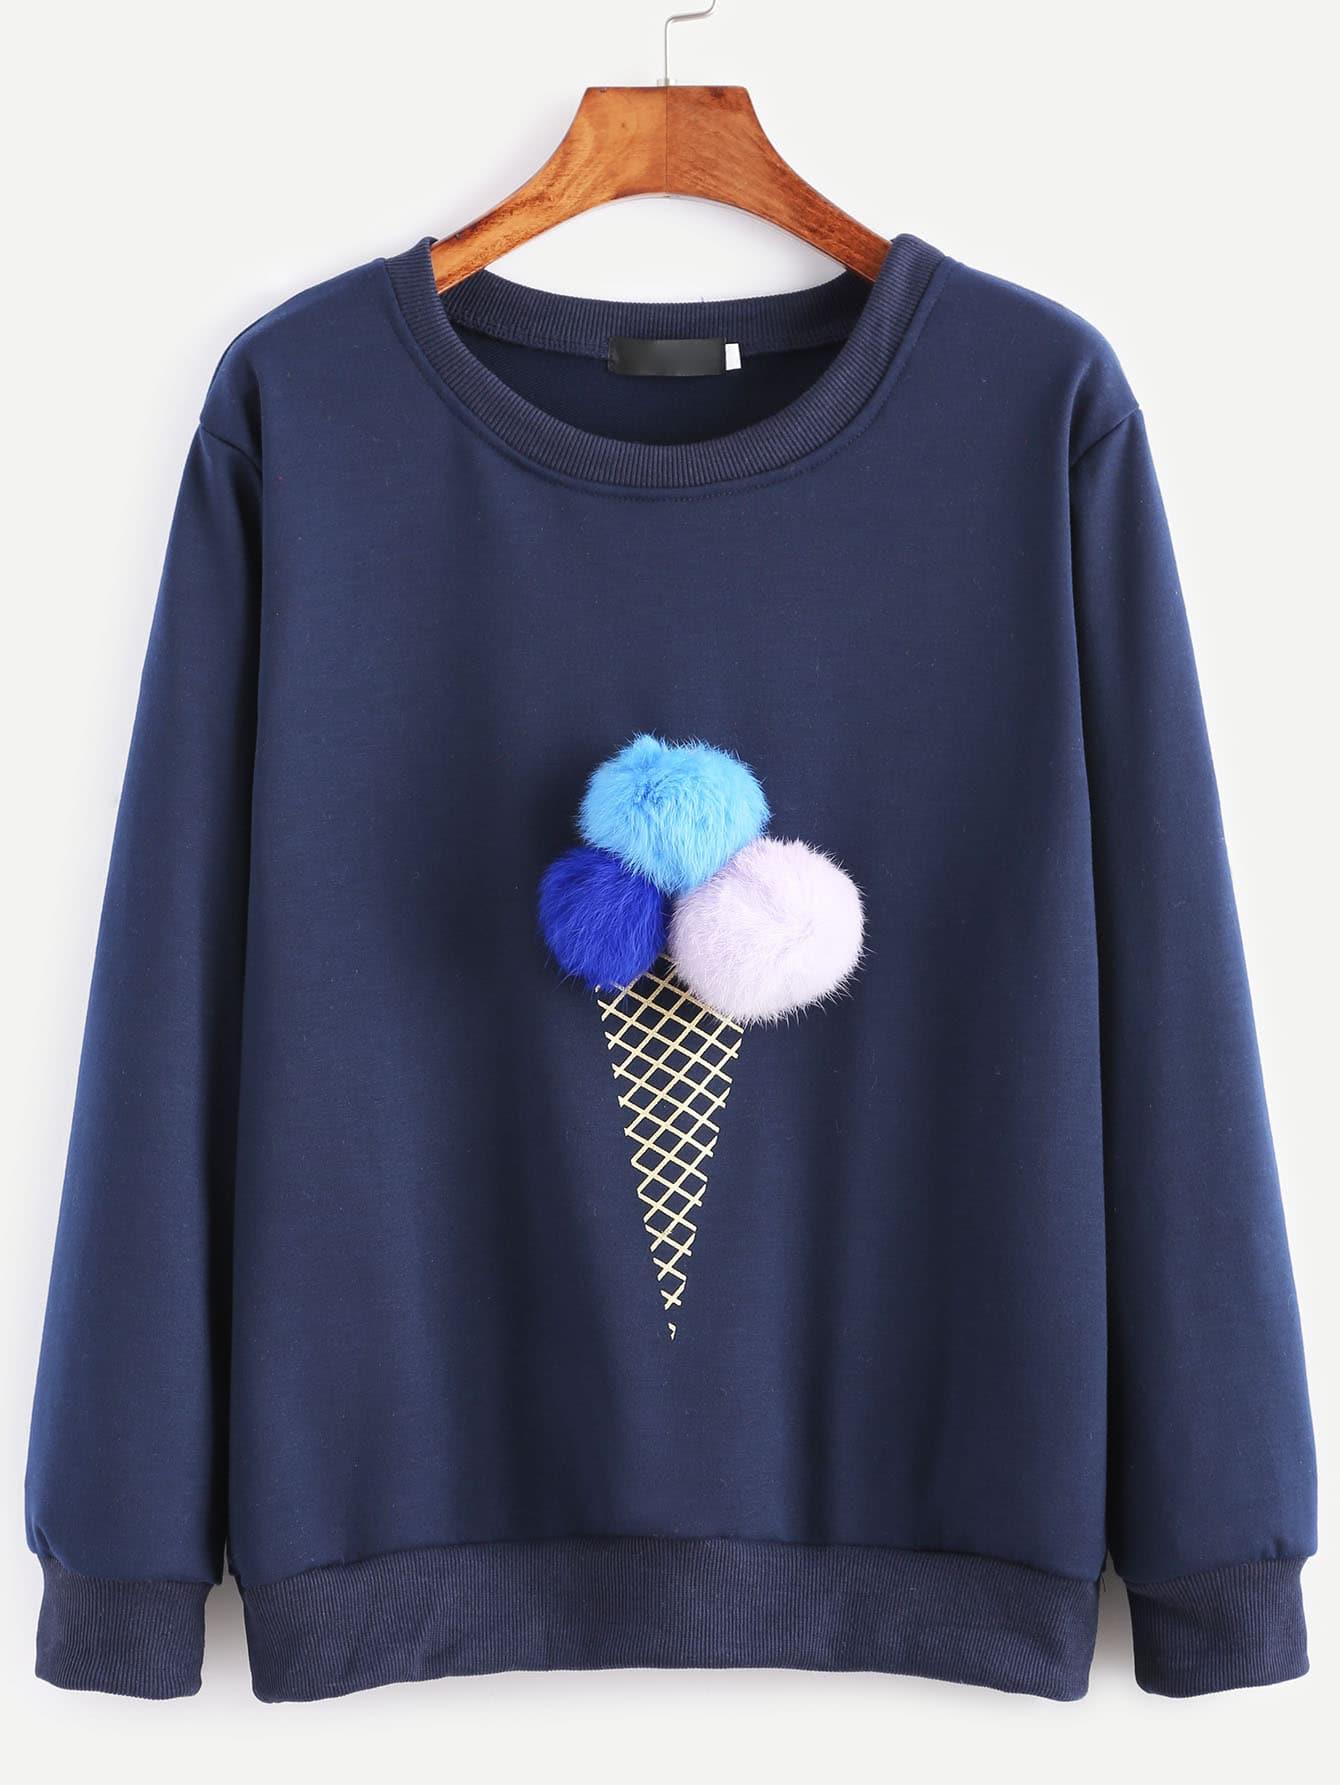 603627593a The Best Sweatshirts, 2018 Sweatshirts Trends: Latest Fashion & In ...